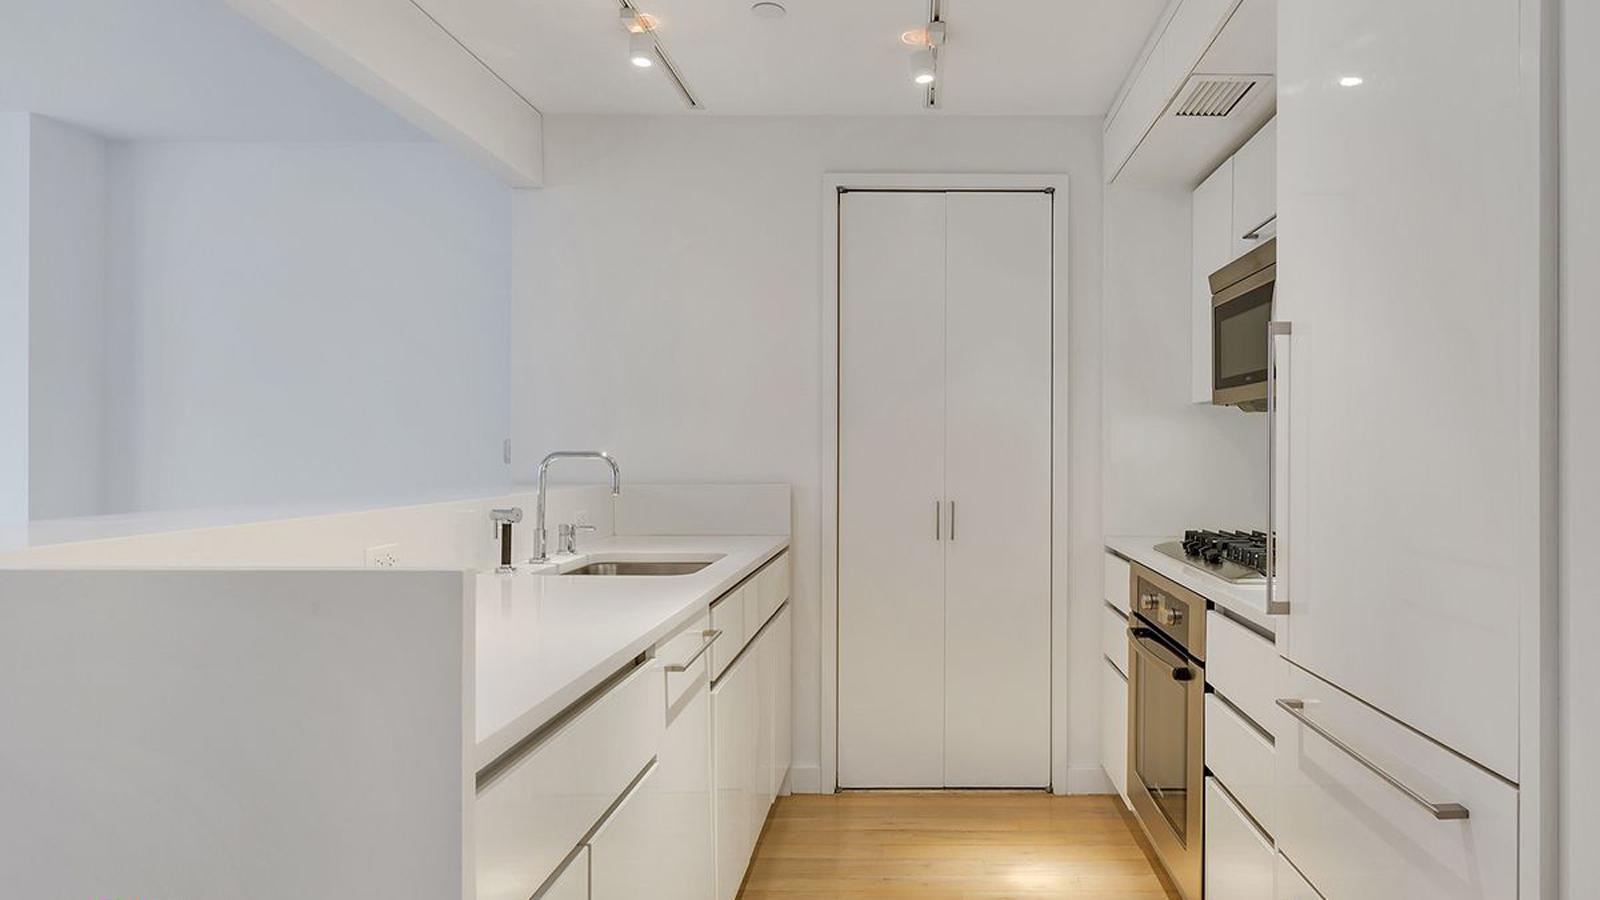 Fifty Franklin, 50 Franklin Street, NYC - Condo Apartments